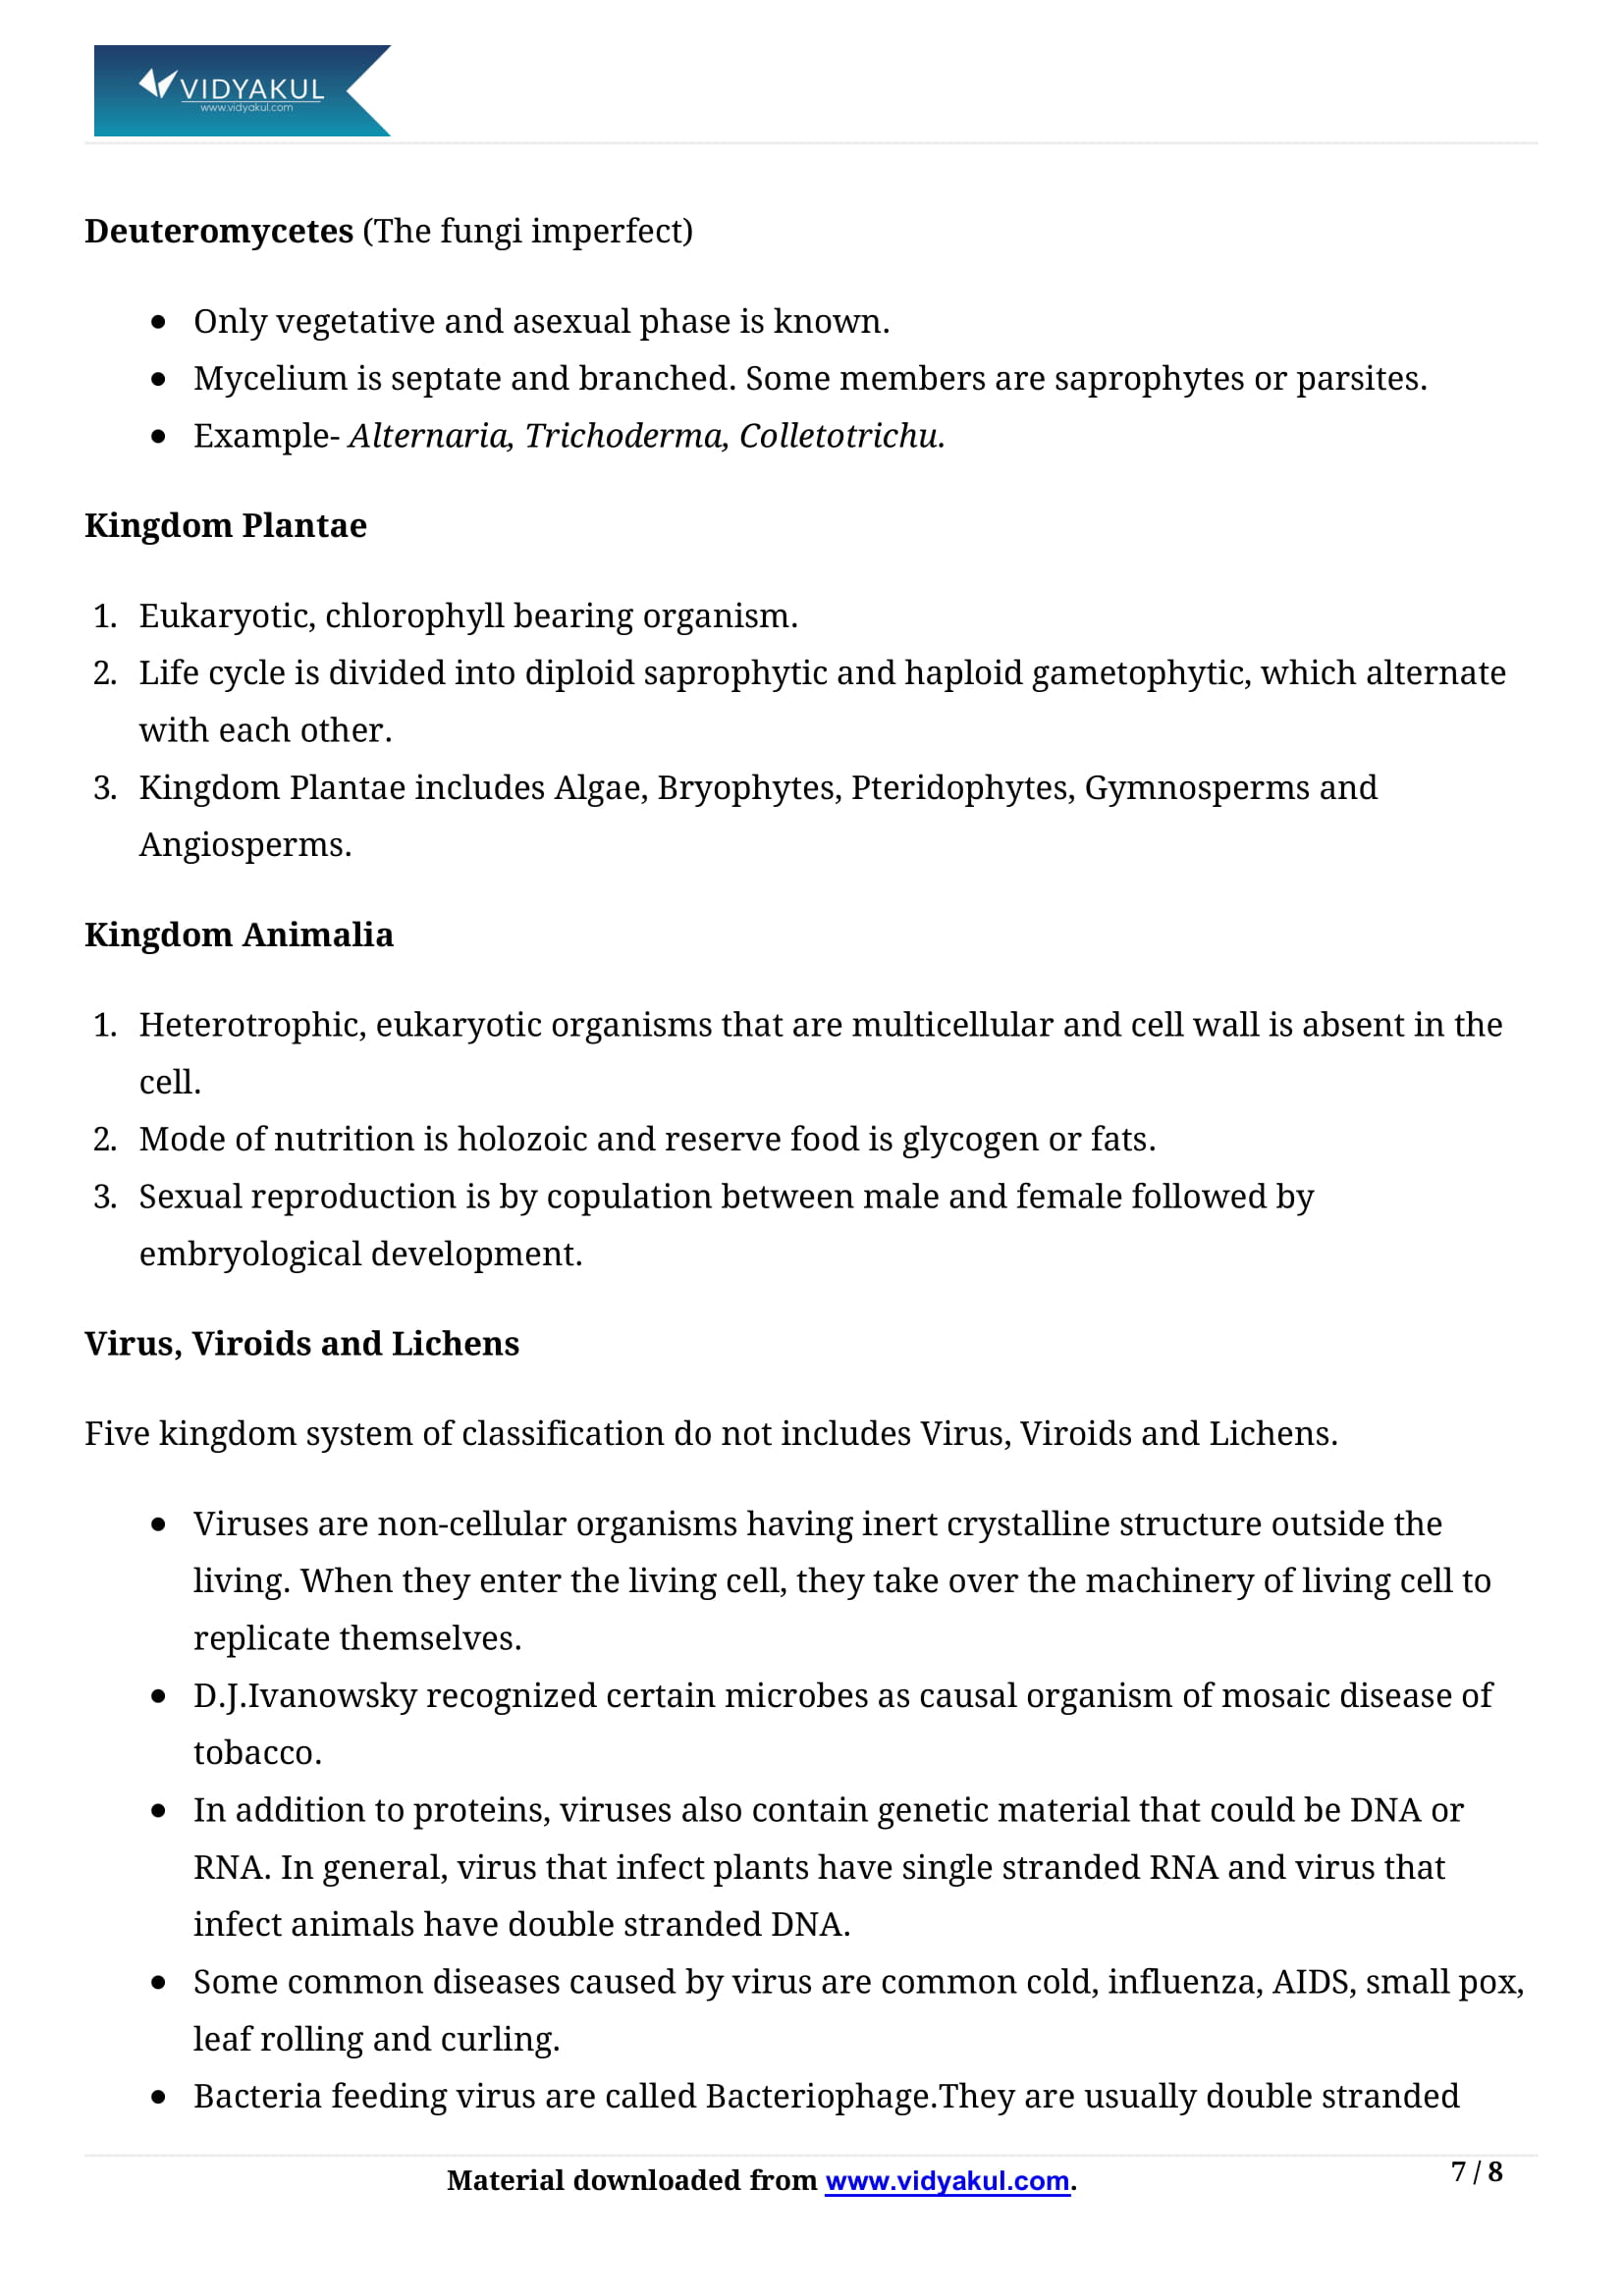 Biological Classification Class 11 Biology Notes Part - 7